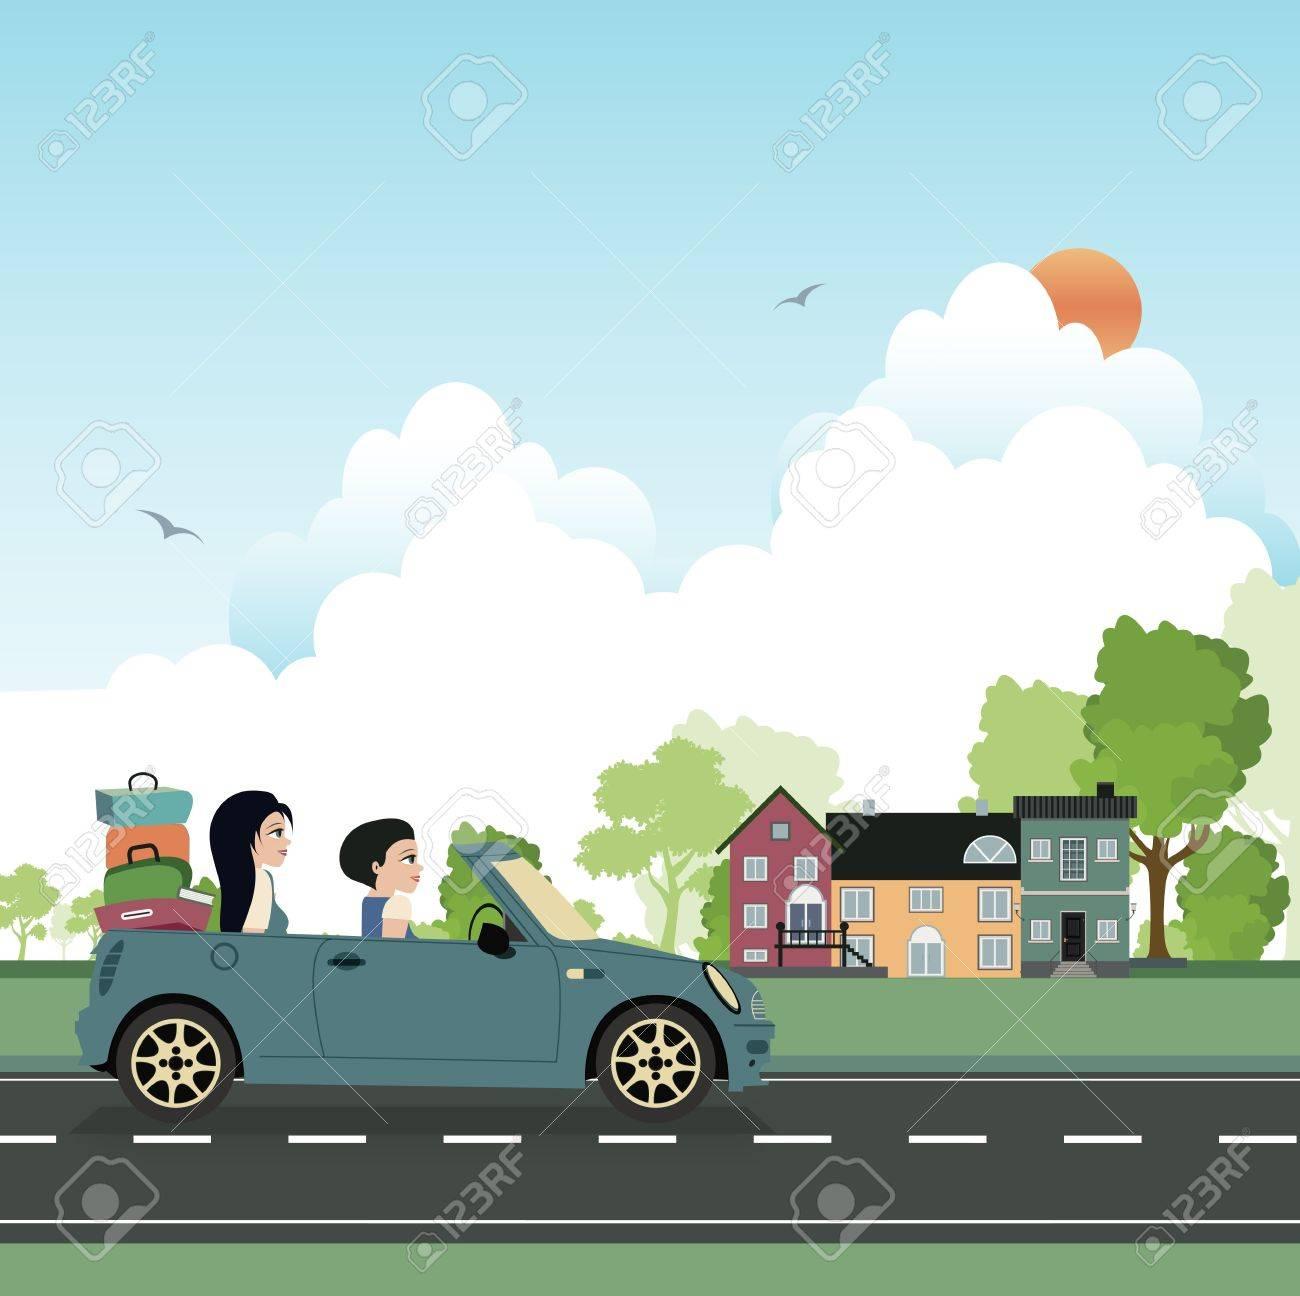 Take a drive to visit family - 22099519